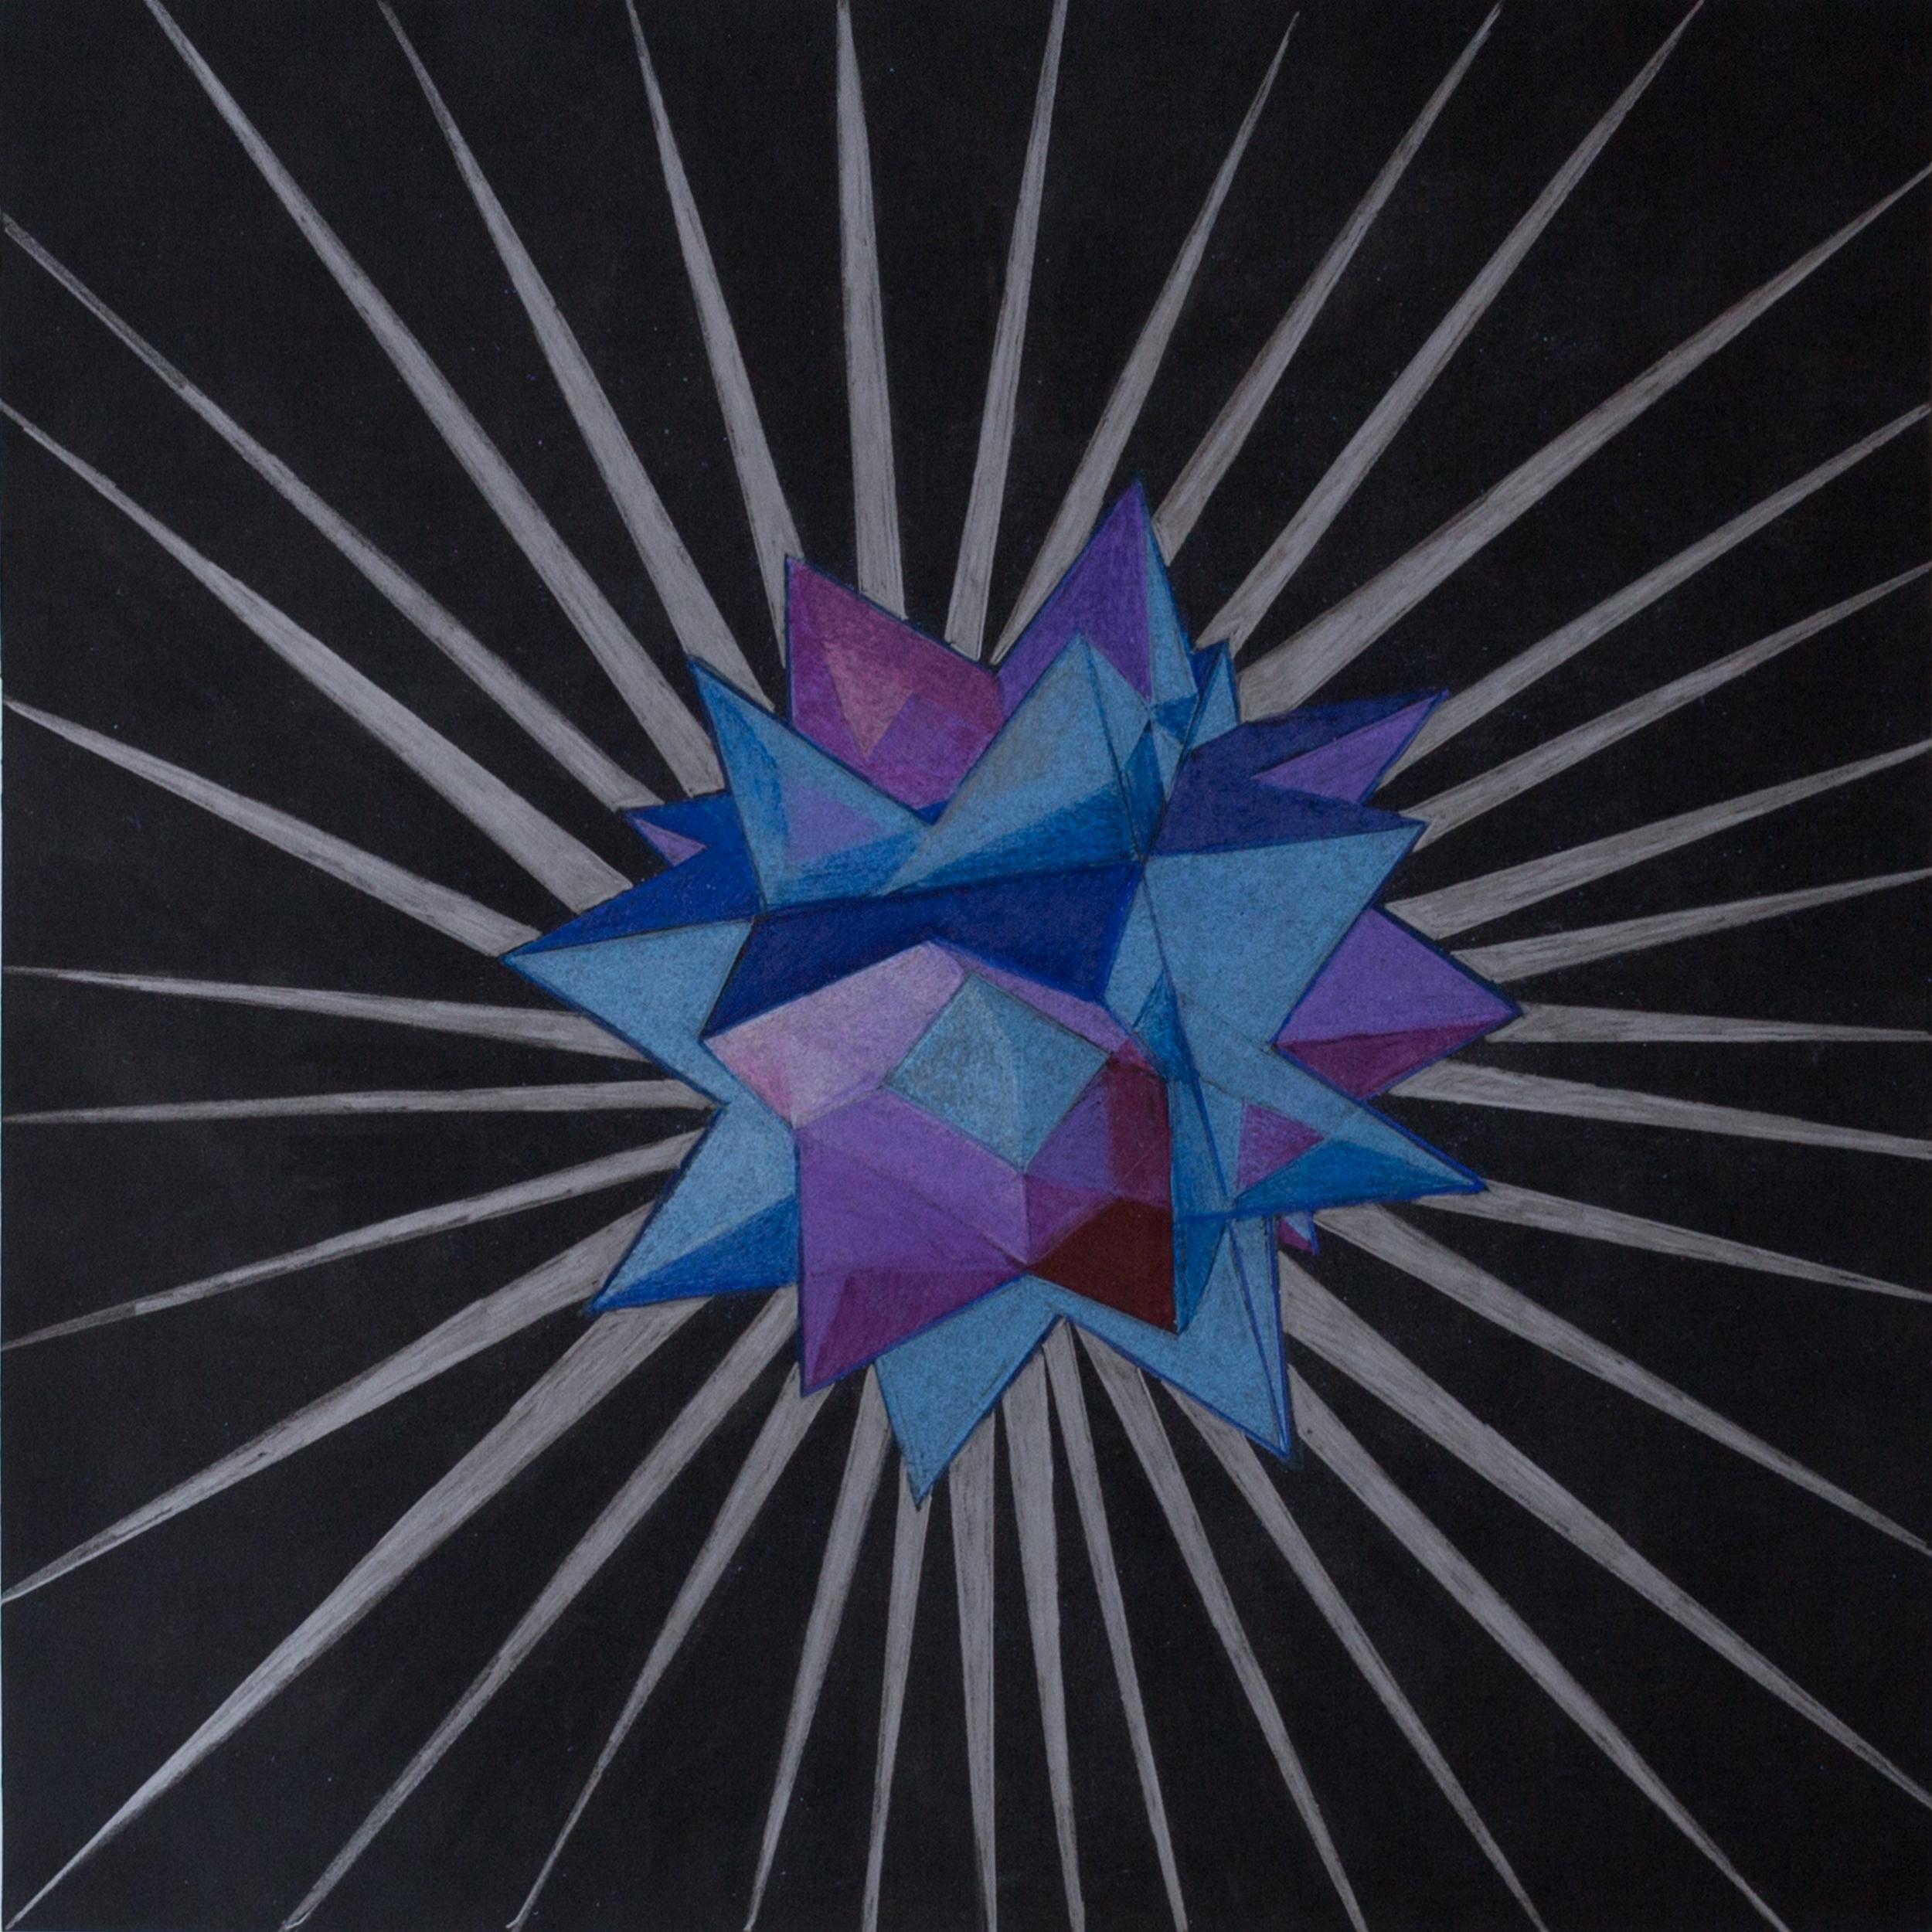 Rotating Purple Star Study, 2018